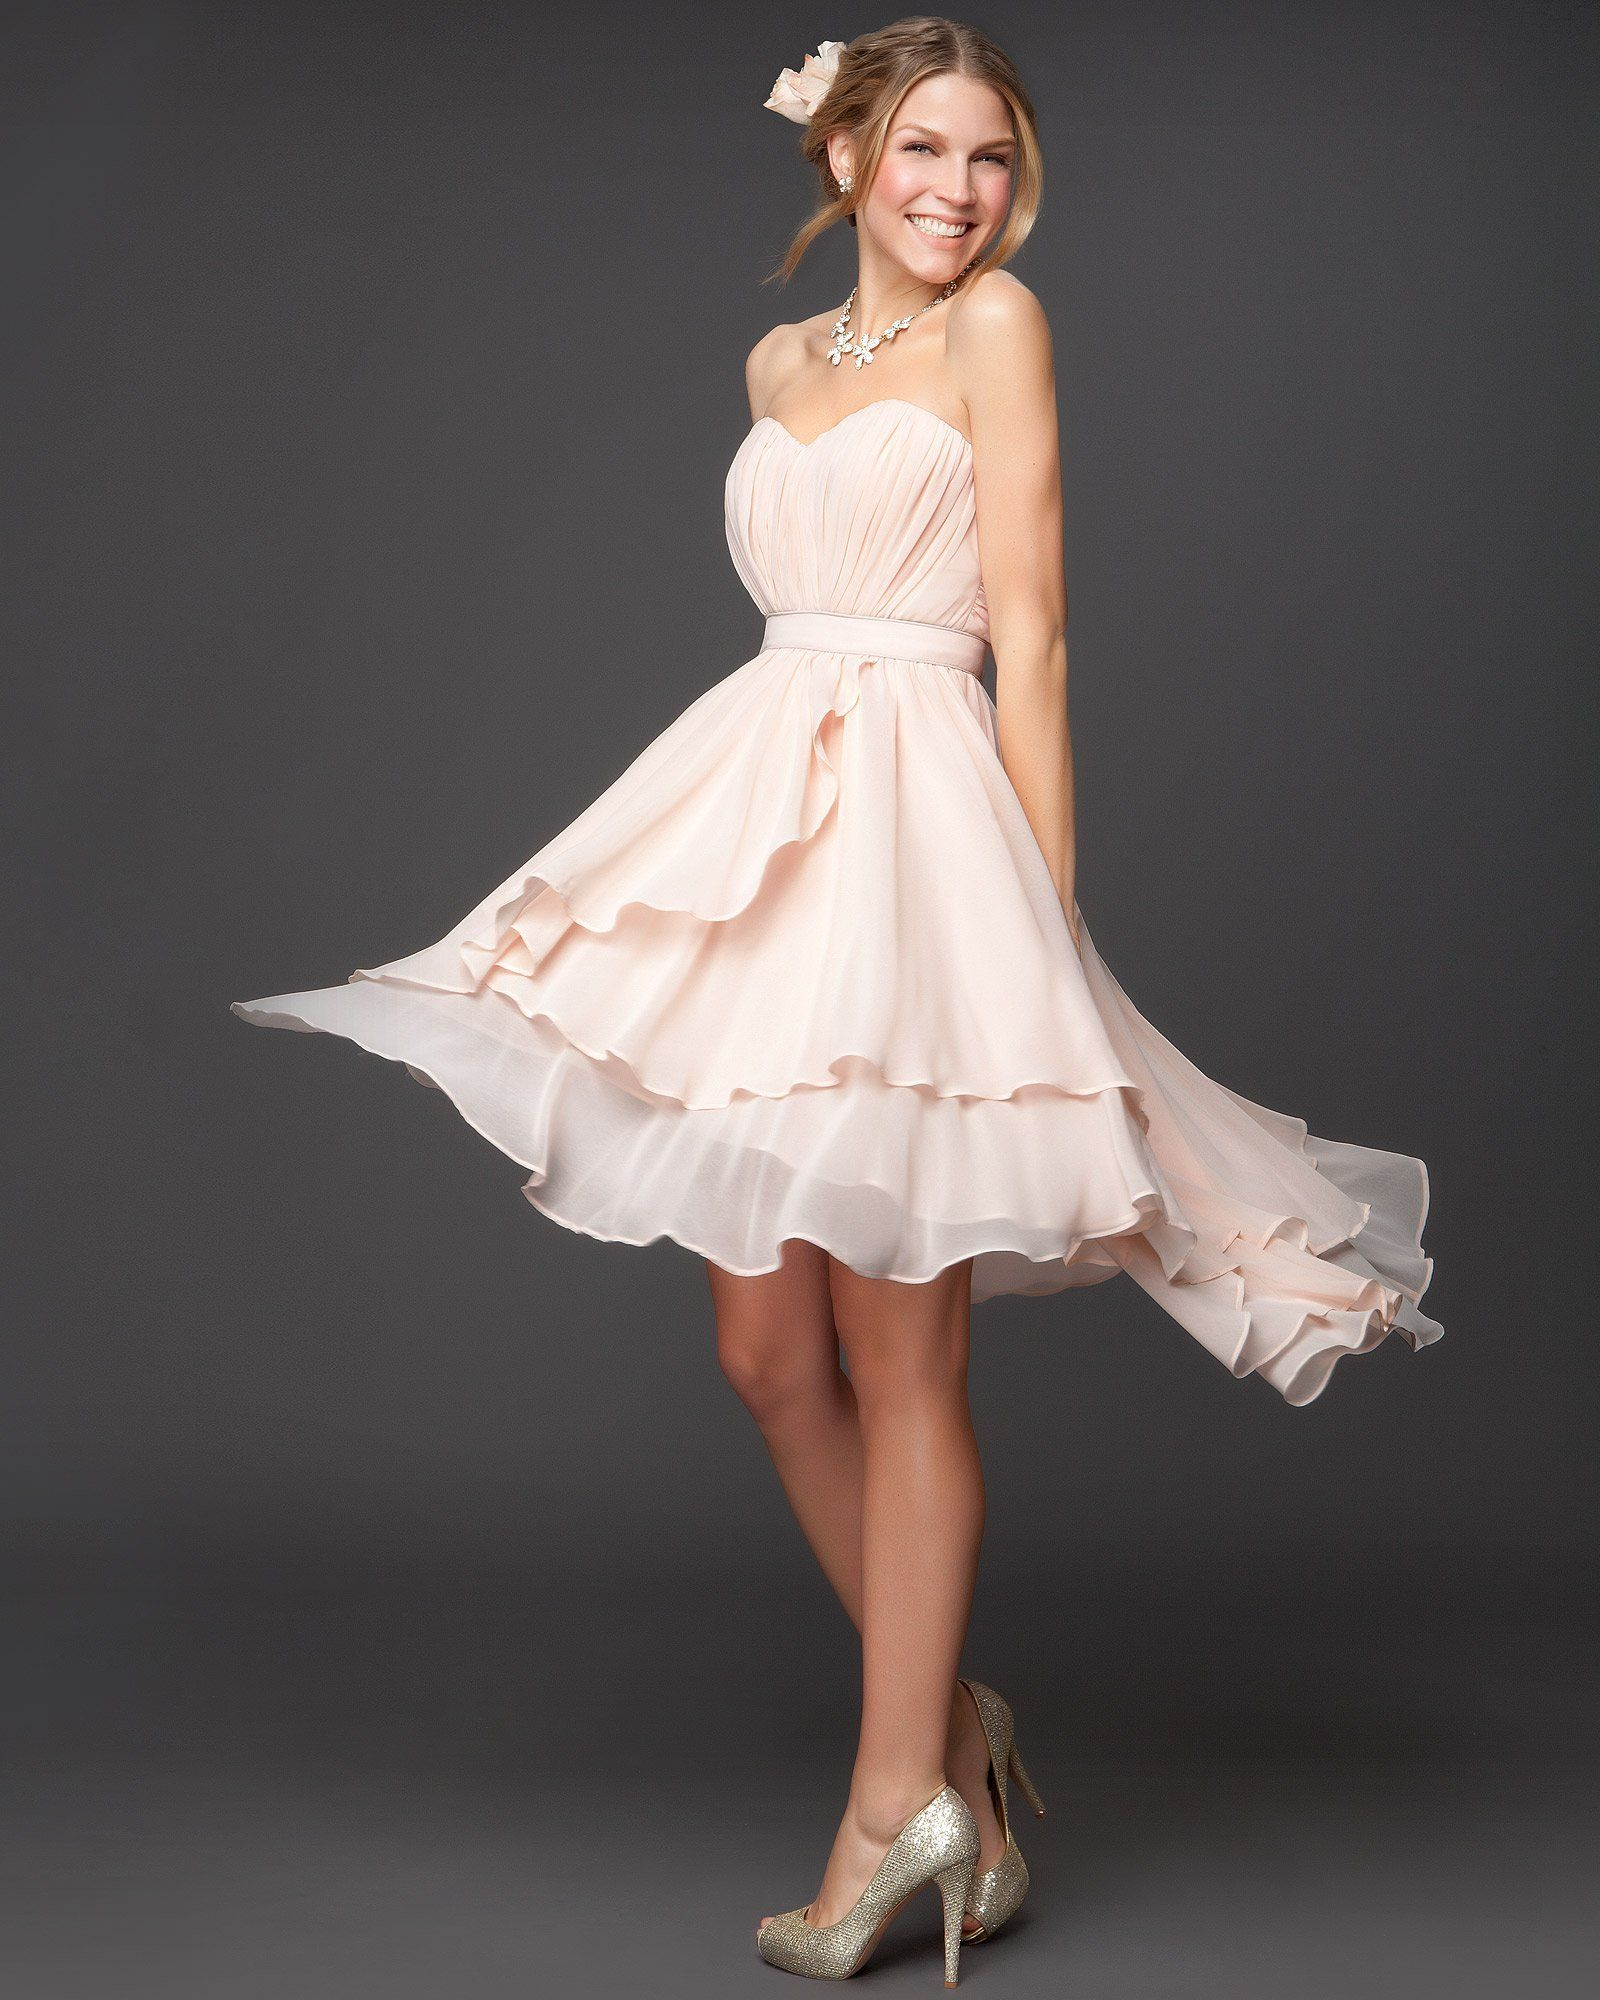 Bebe pale pink bridesmaid dress idea said yes not i do yet